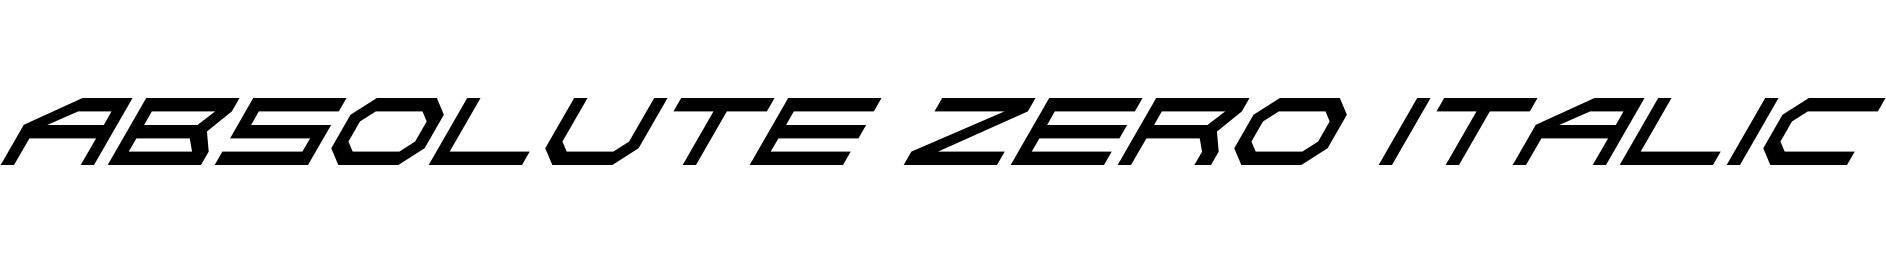 Absolute Zero Italic